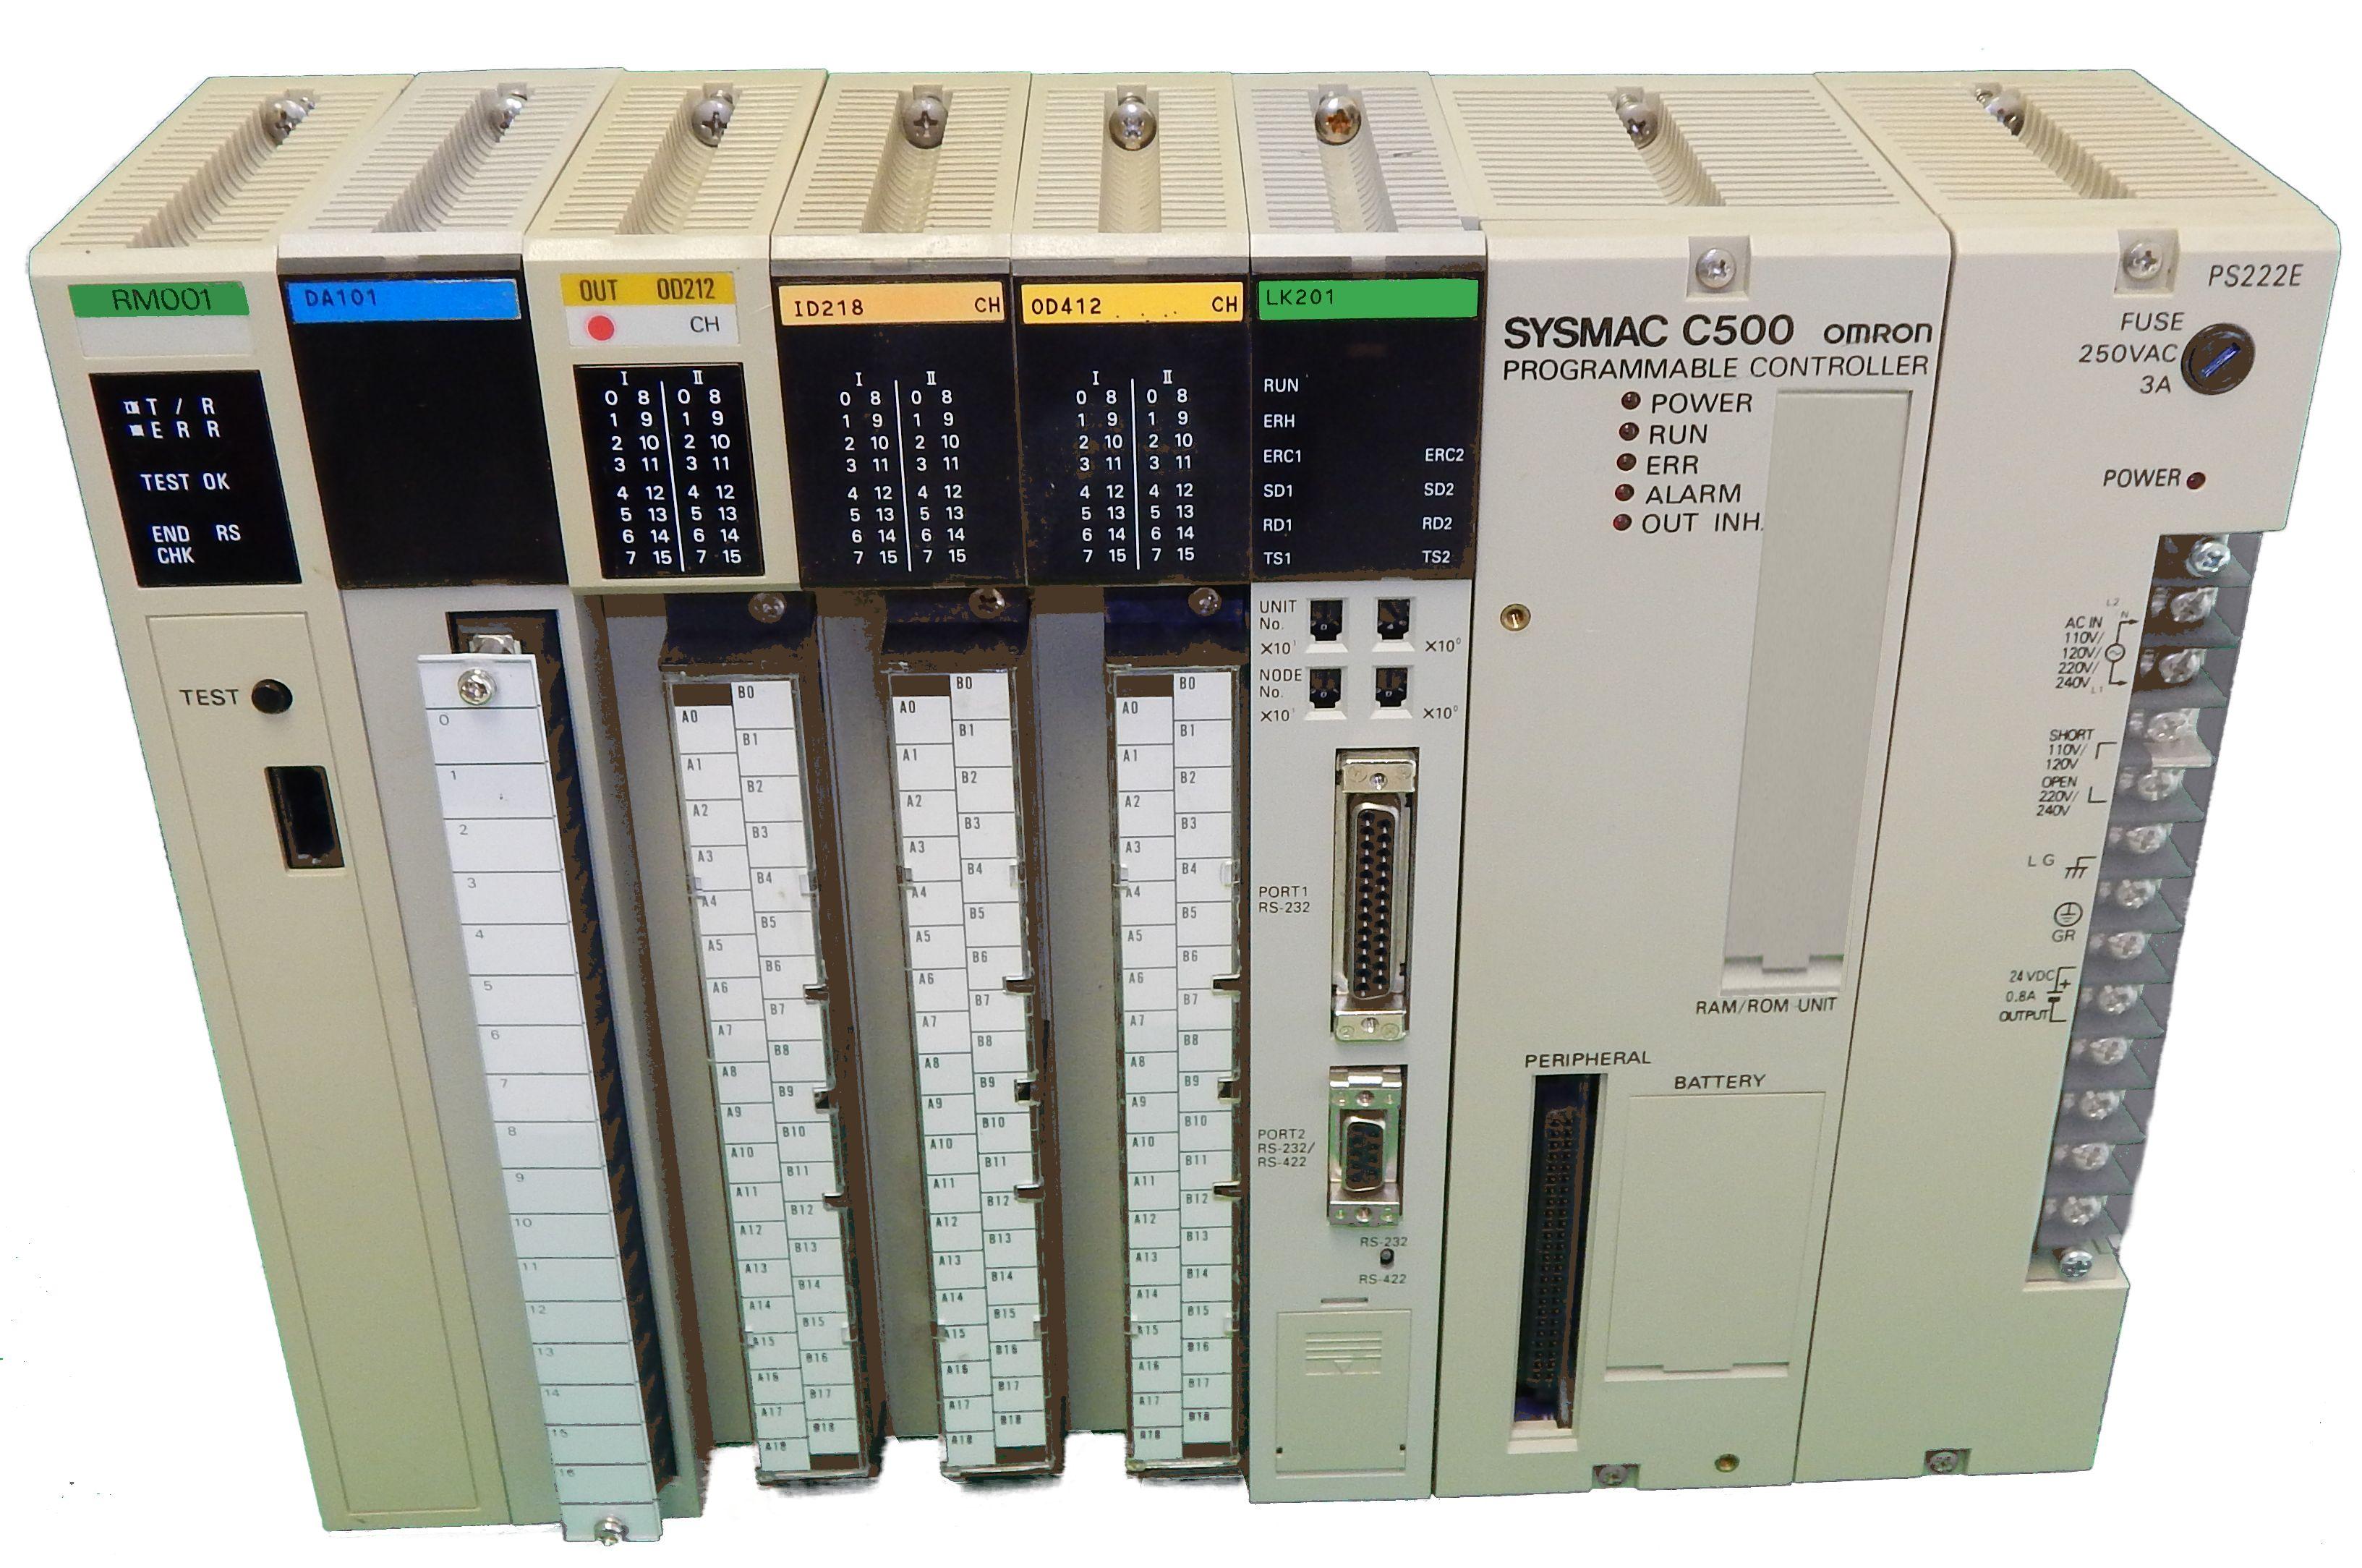 3G2A5-CPUK1